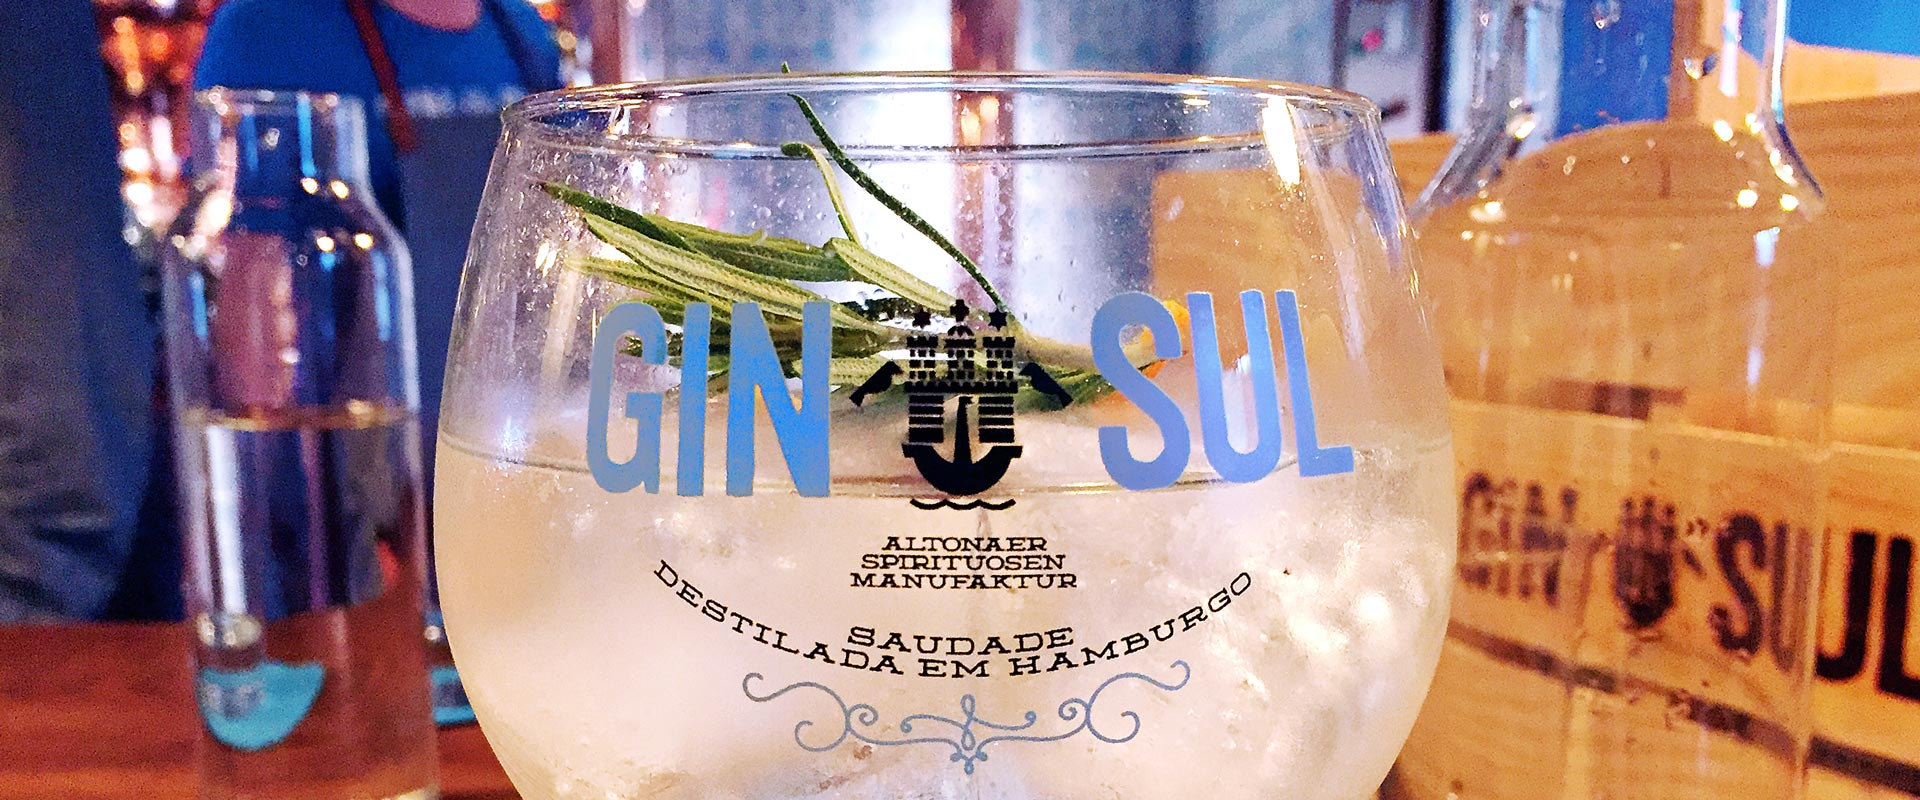 Der Gin des Südens.